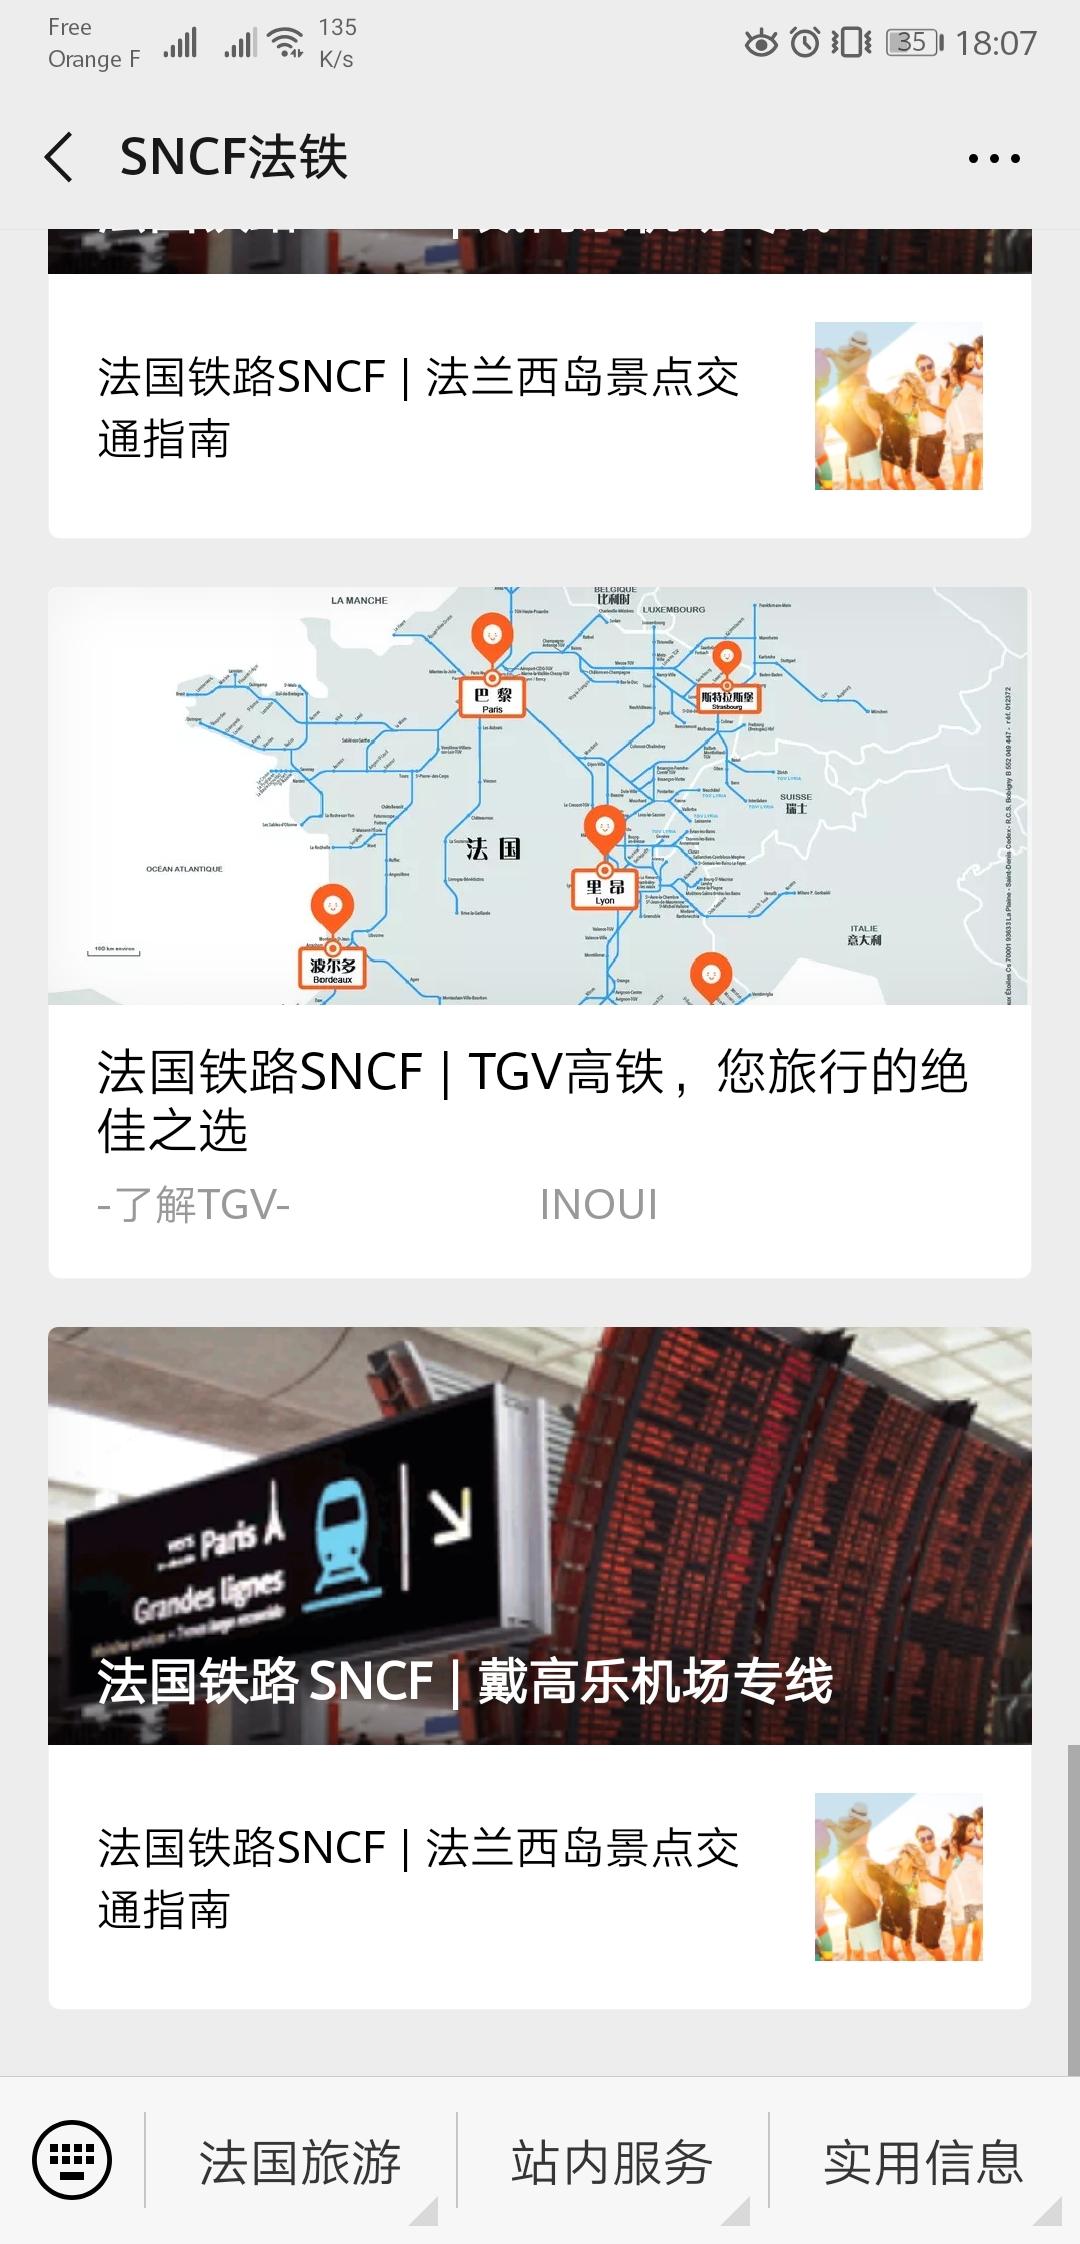 SNCF WeChat account